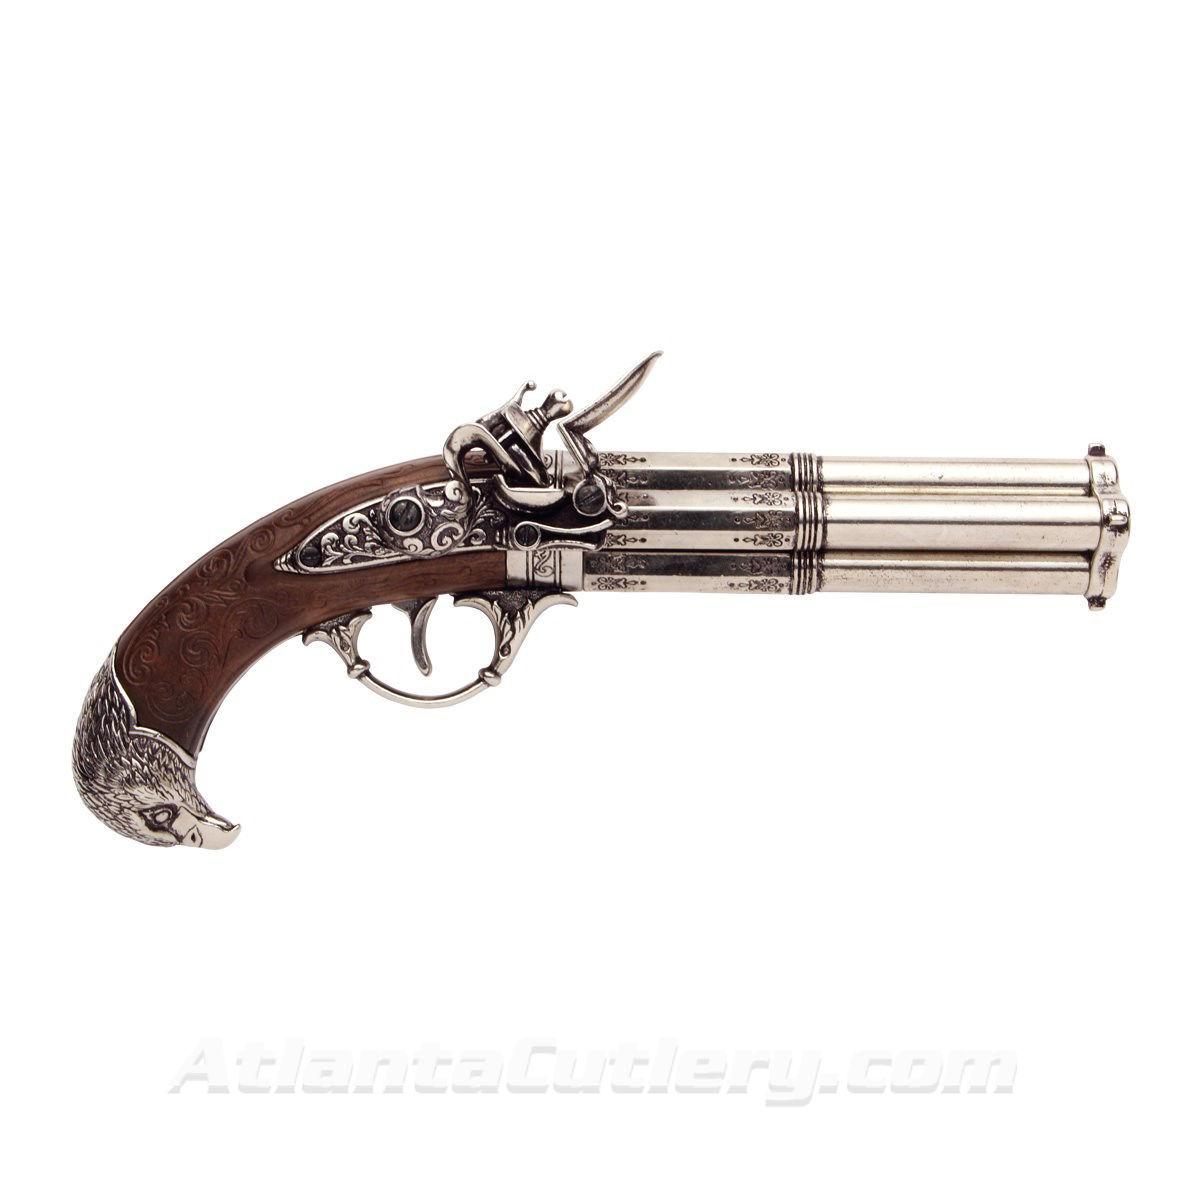 18th Century Four Barrel Flintlock Pistol Replica